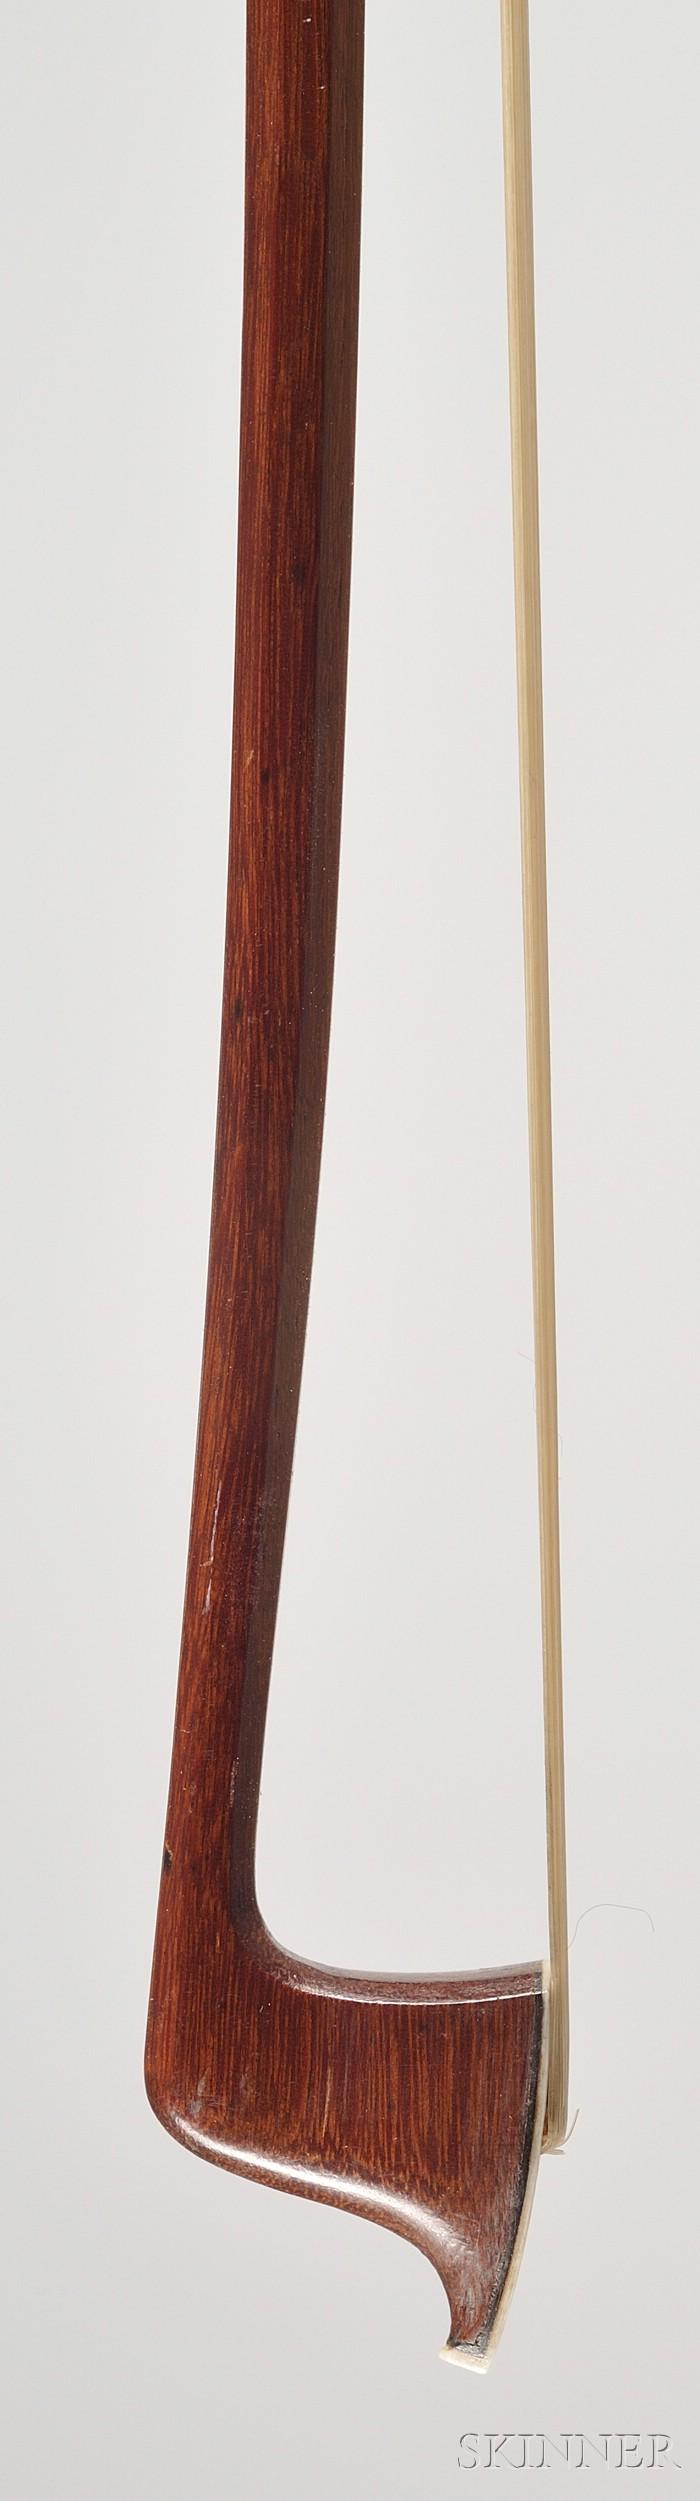 Silver Mounted Violin Bow, Otto Durrschmidt